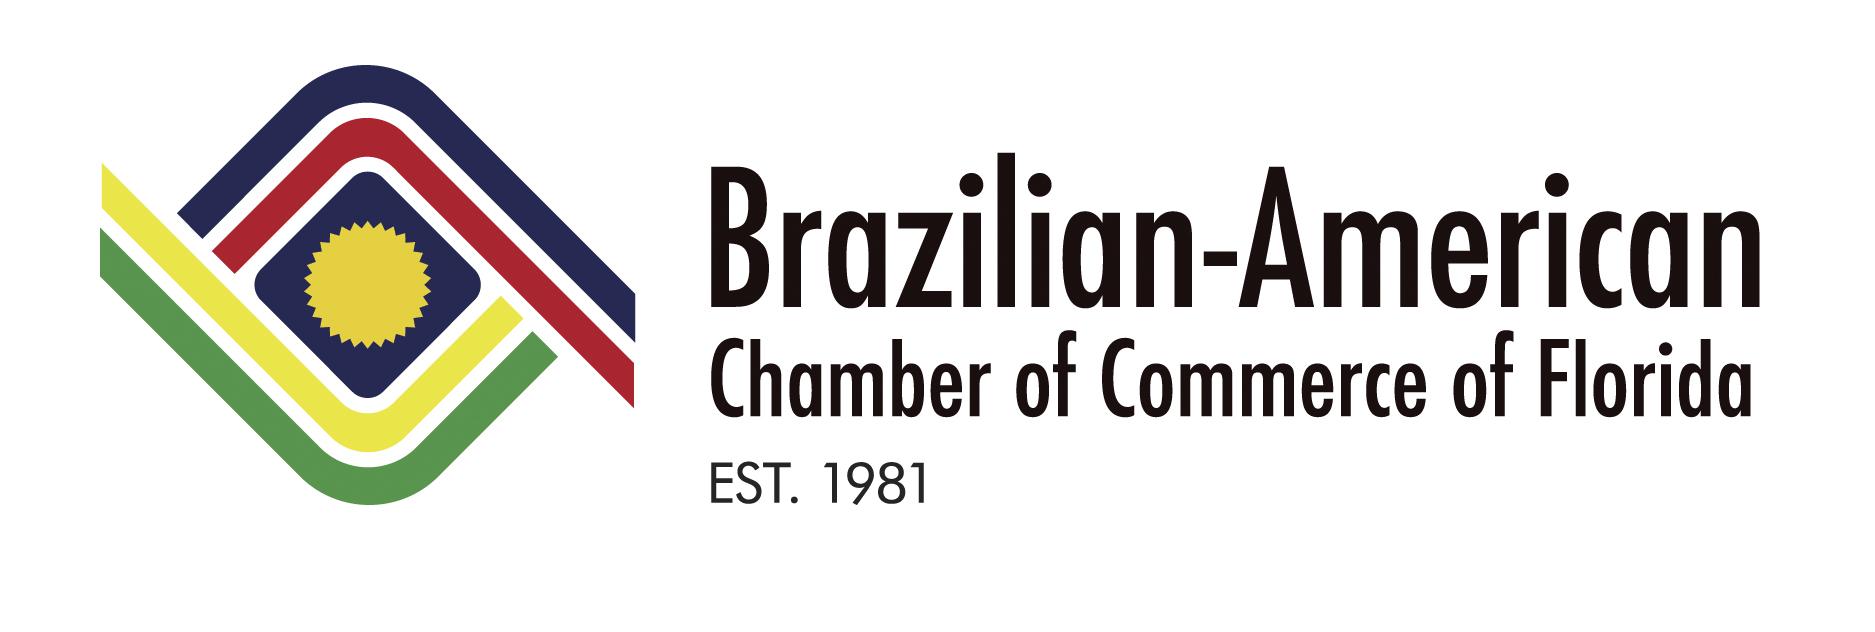 BACCF_logo_1981_final